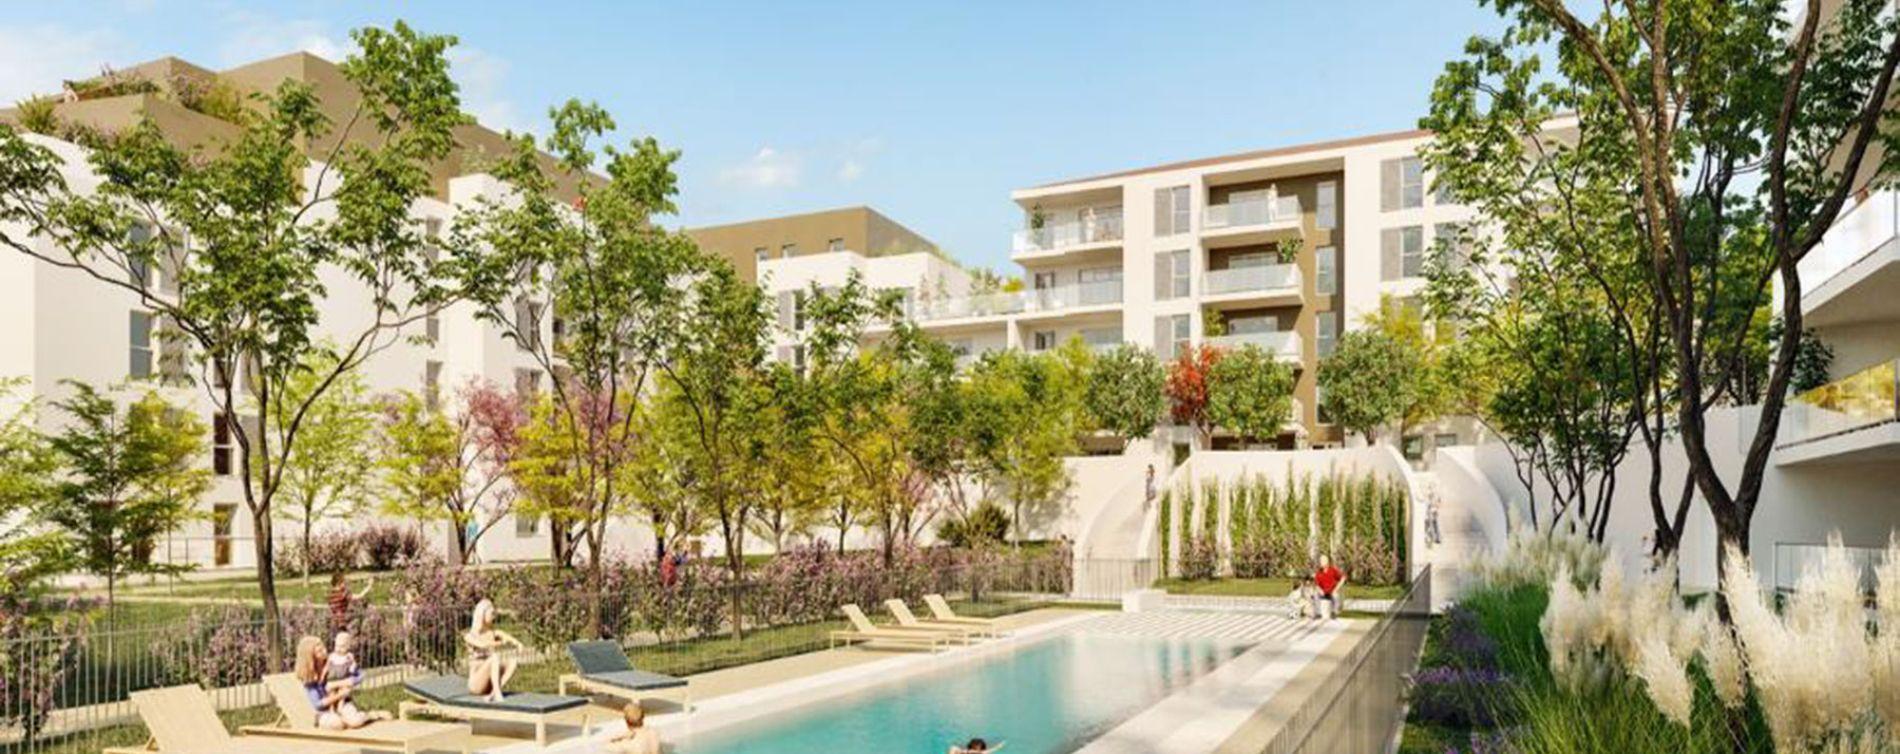 Résidence Jardin Augustin à Marseille